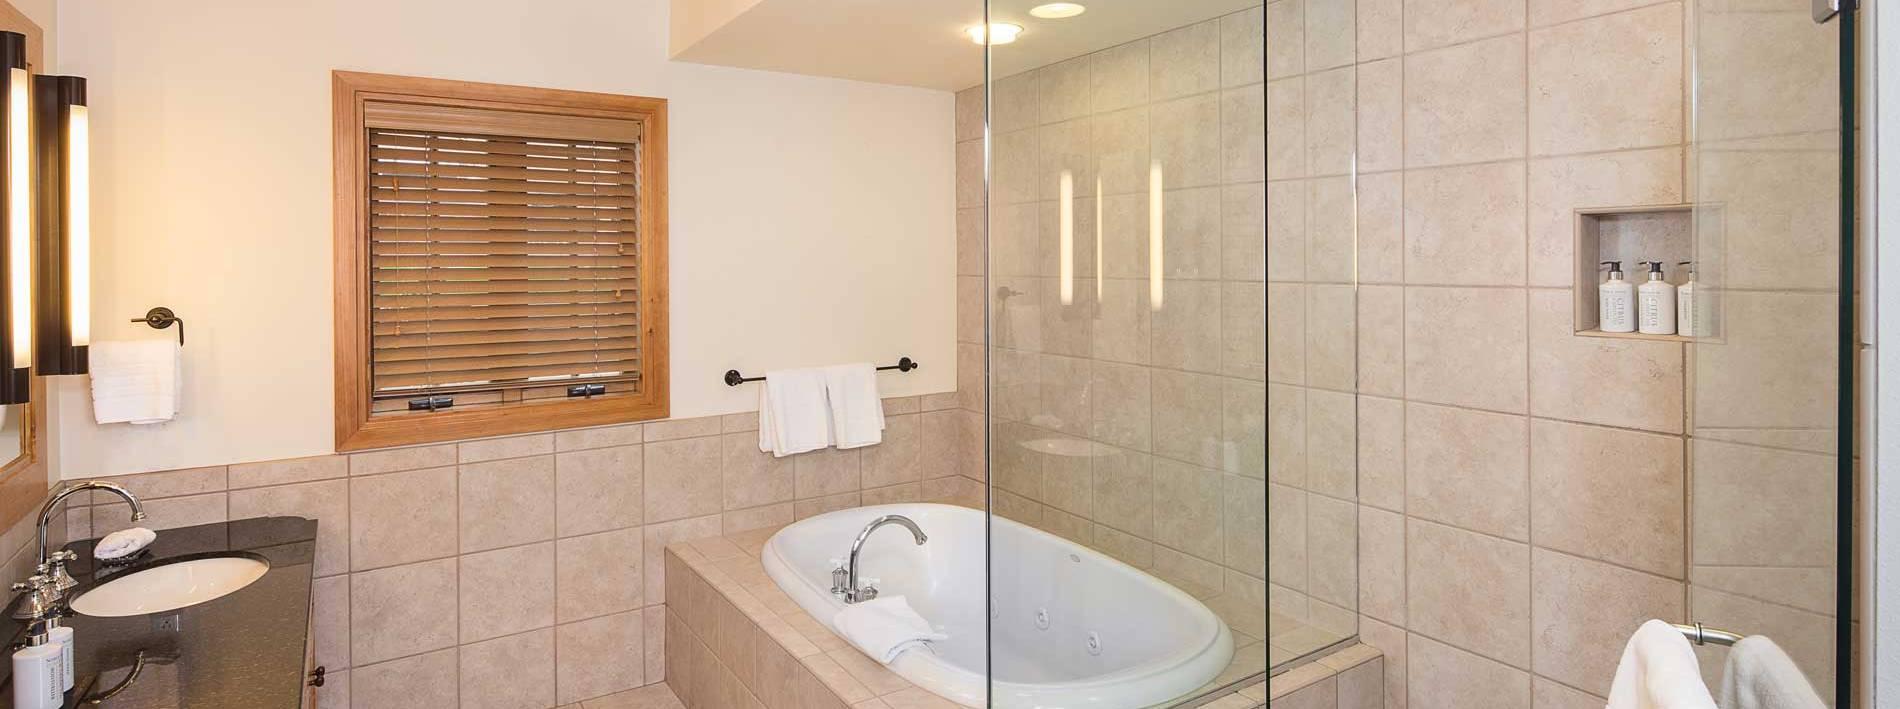 Sweetwater Bathroom.